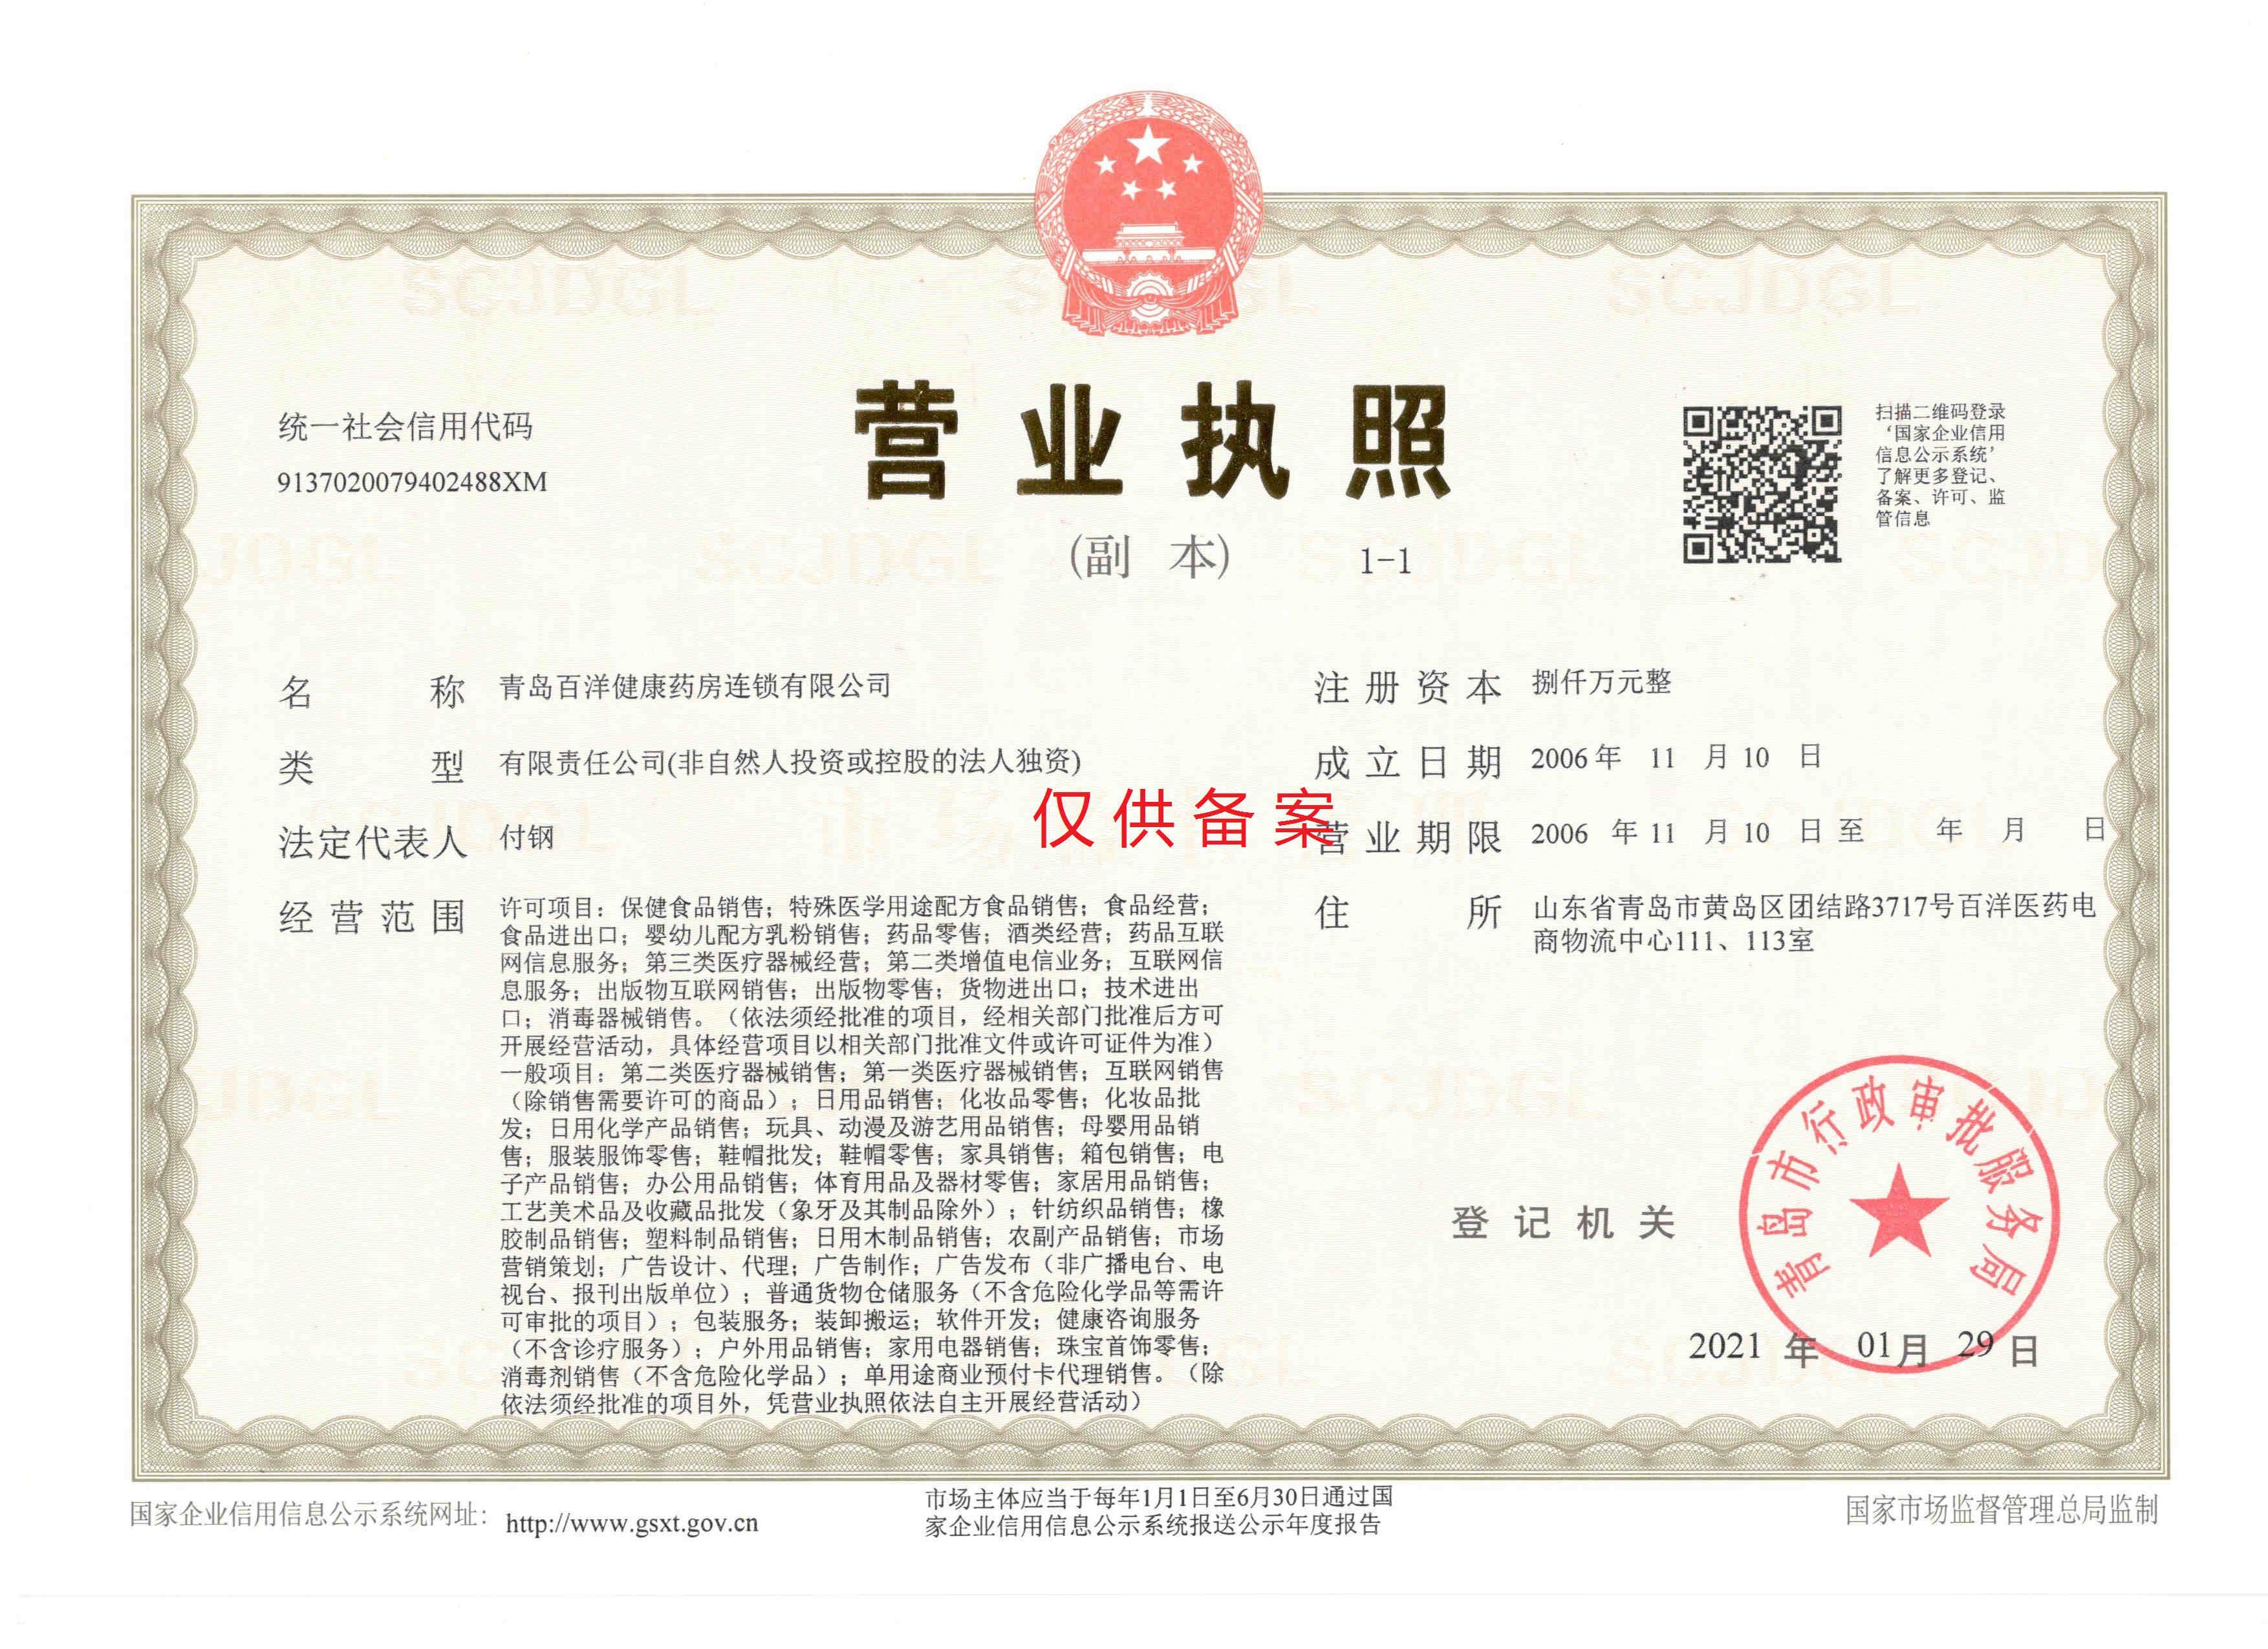 https://shopncstaticimage.baiyangwang.com/shop/article/06675950841019161.jpg